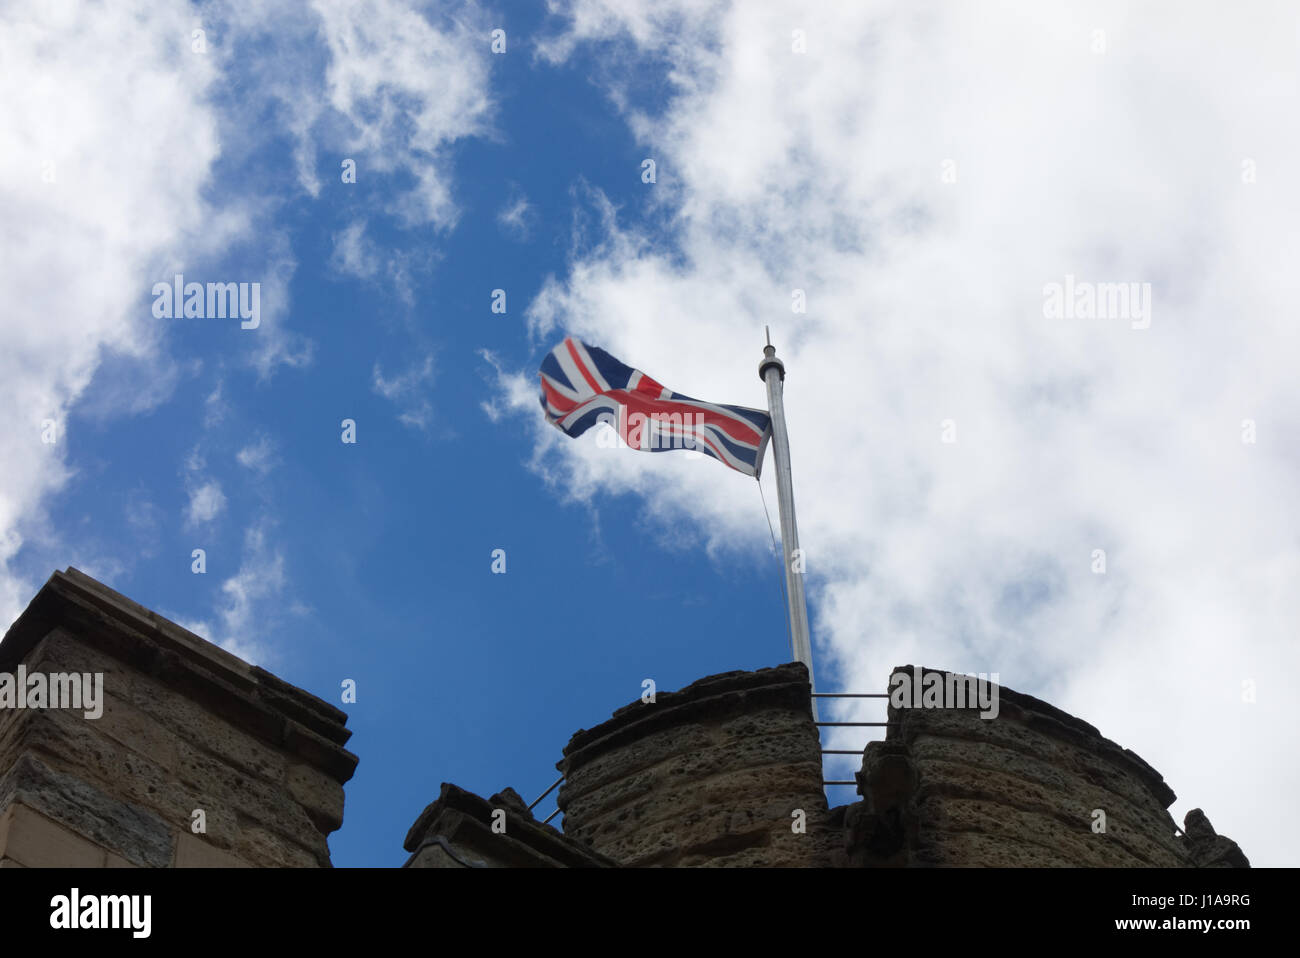 Lincoln Castle Union Flag waving - Stock Image